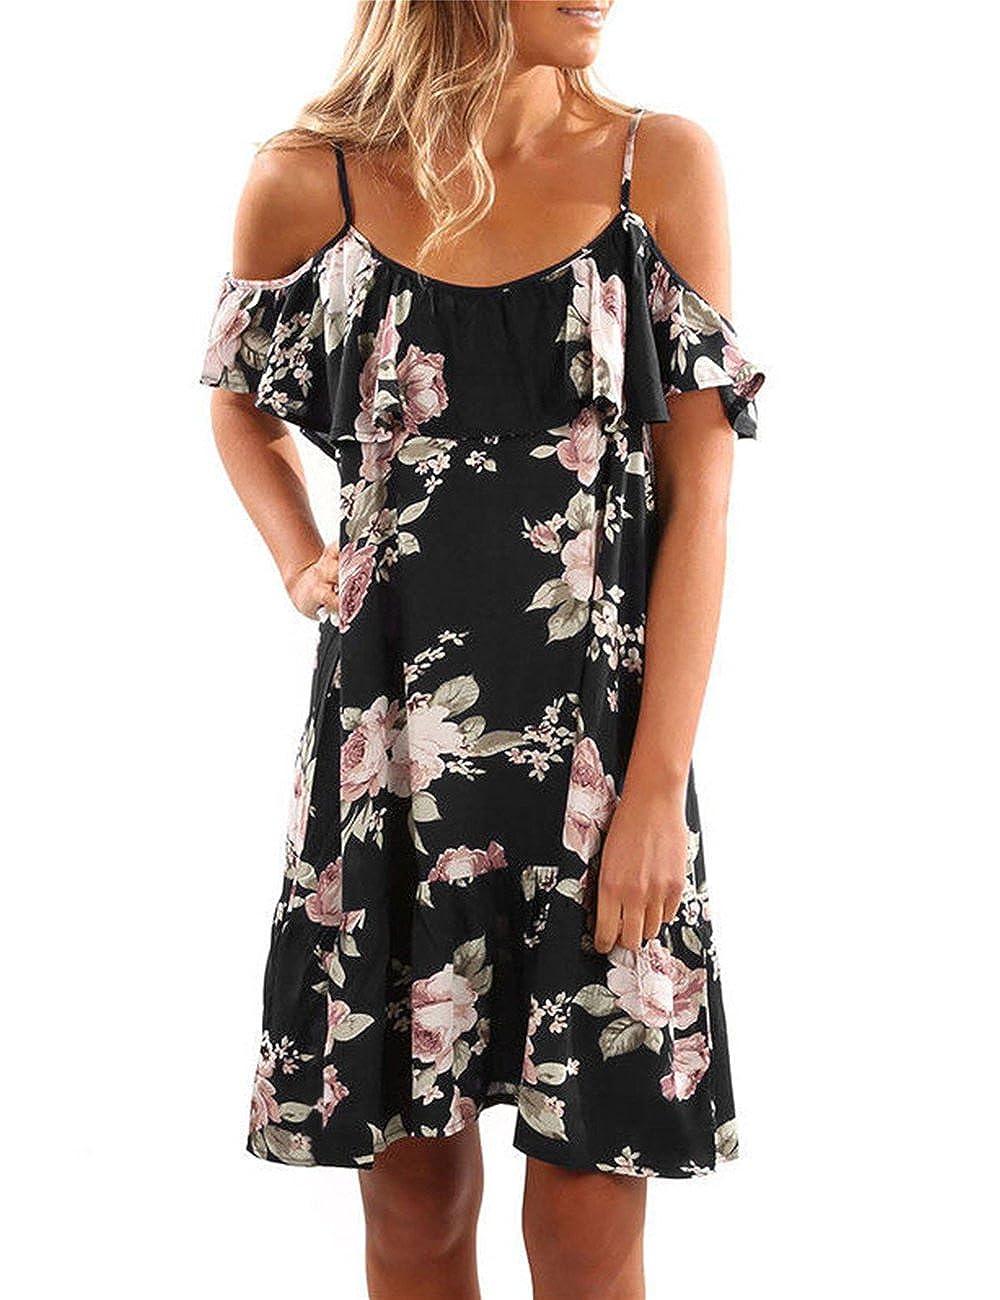 c08da69a766 Top 10 wholesale Cute Short Sexy Dresses - Chinabrands.com